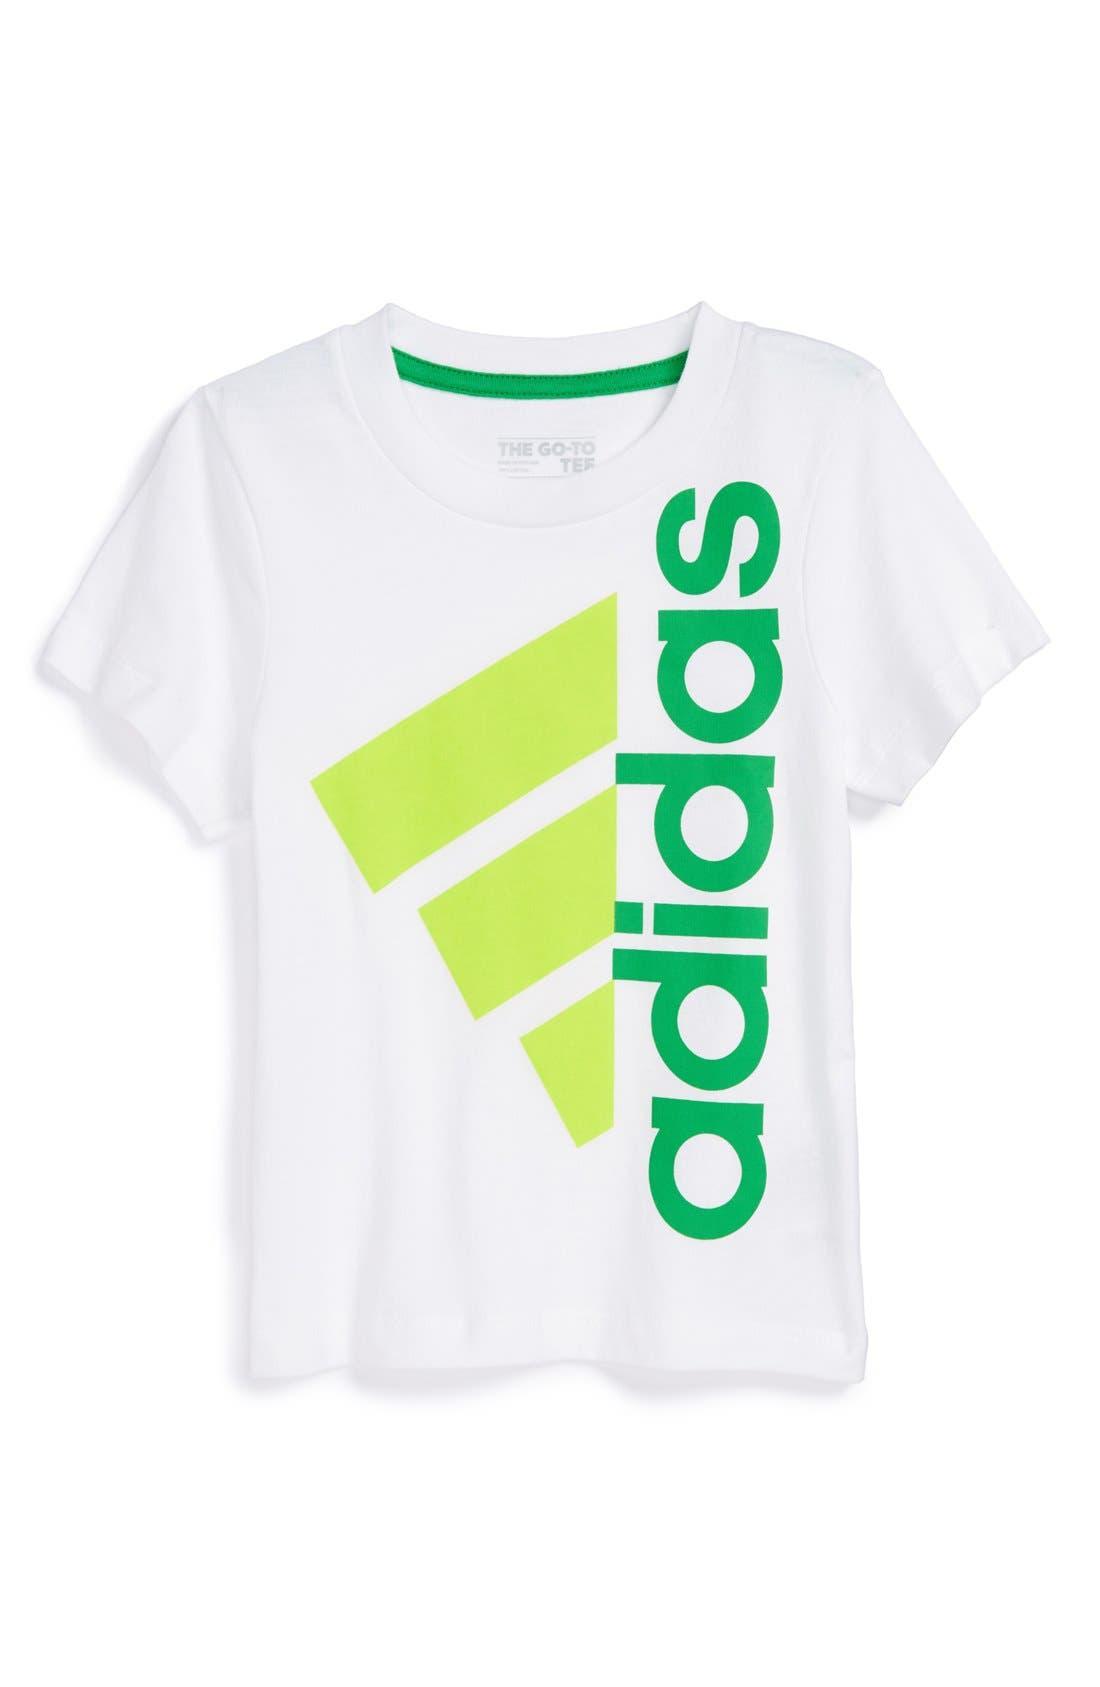 Alternate Image 1 Selected - adidas 'Bold Performance' T-Shirt (Toddler Boys)